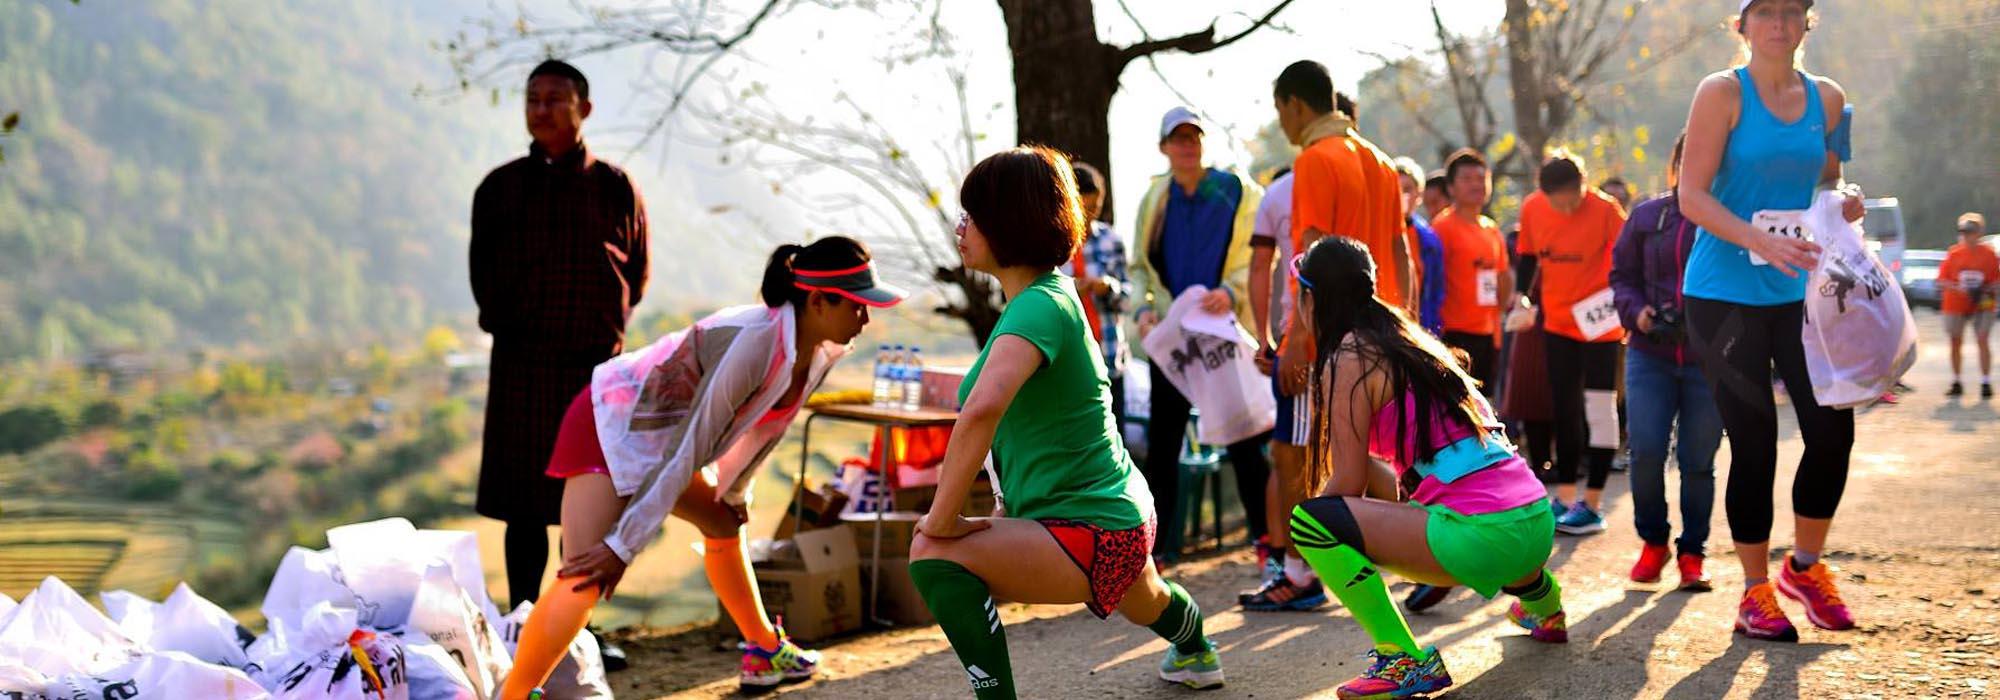 Bhutan International Half Marathon